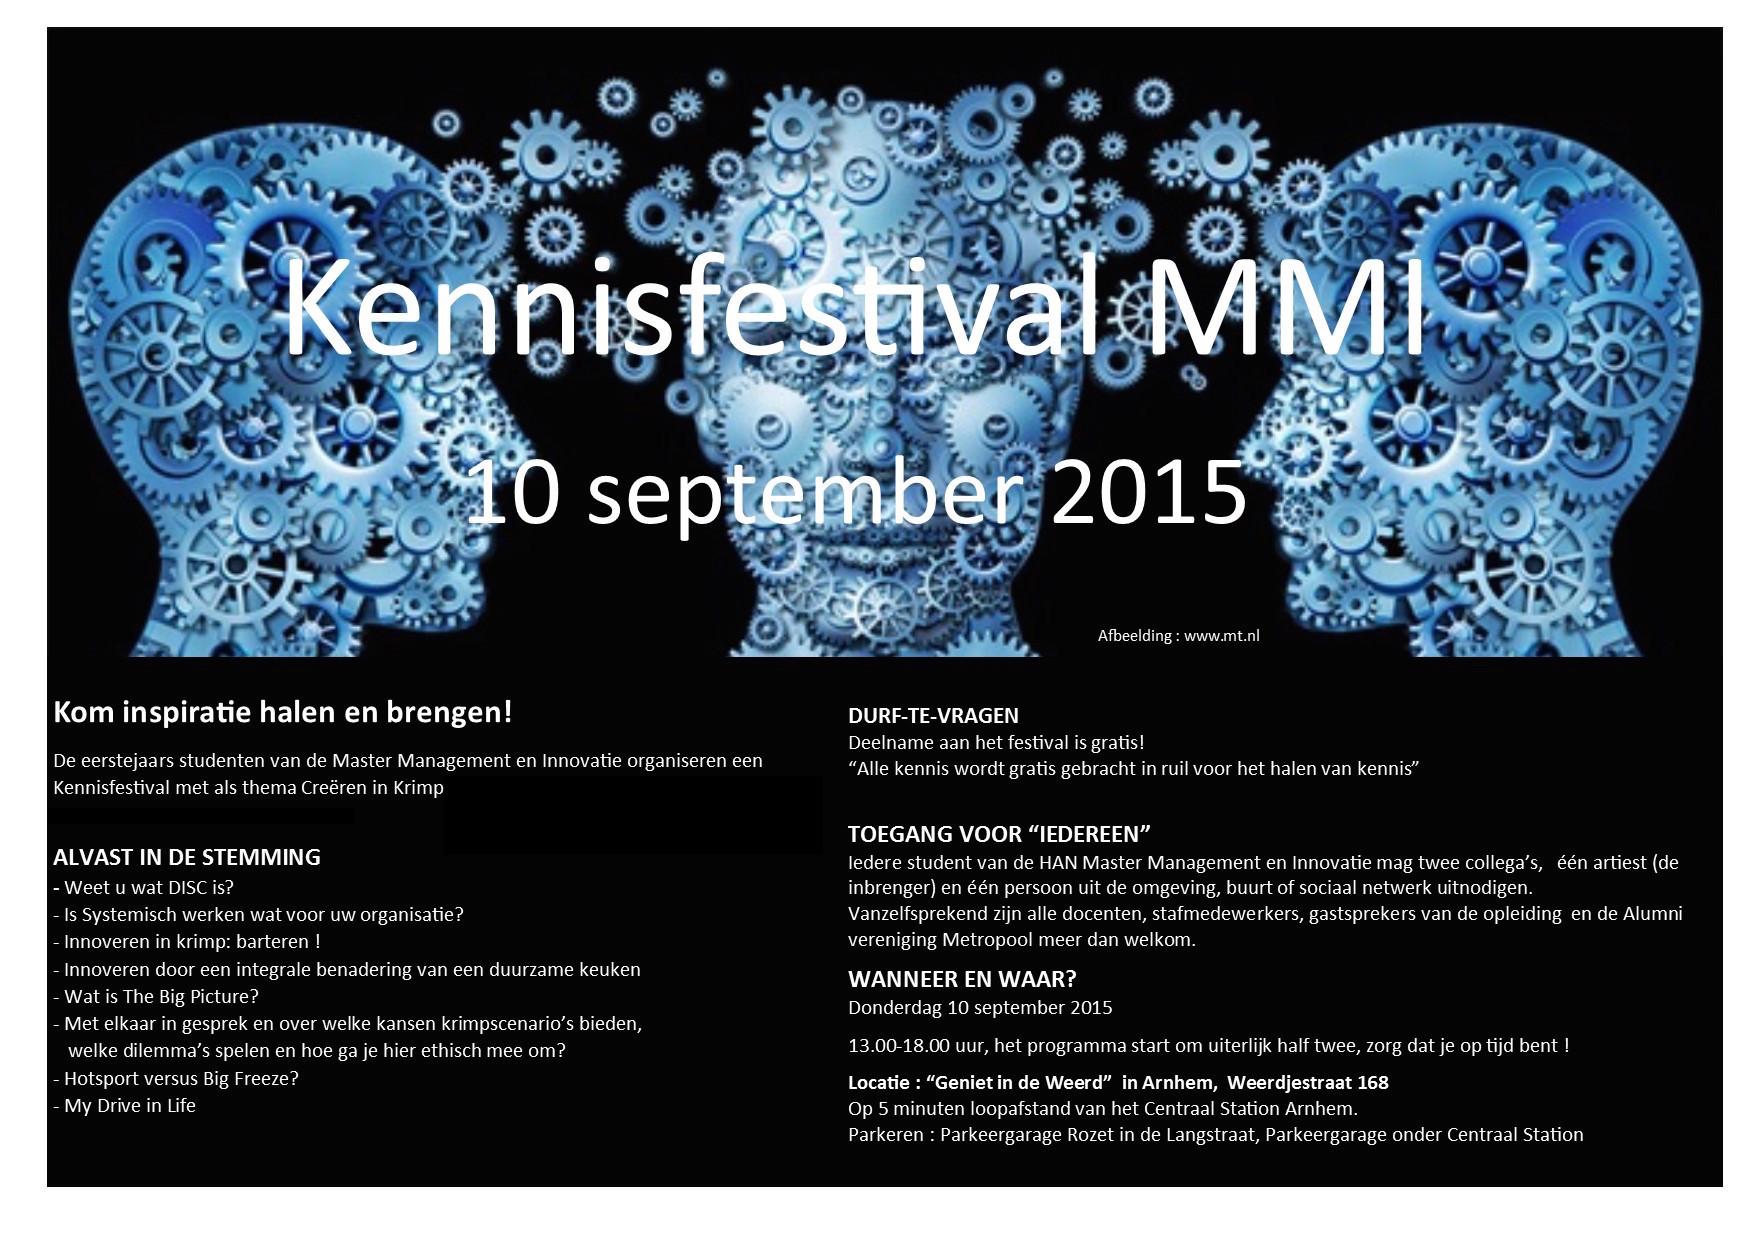 uitnodiging-Kennisfestival-MMI-10-september-2015